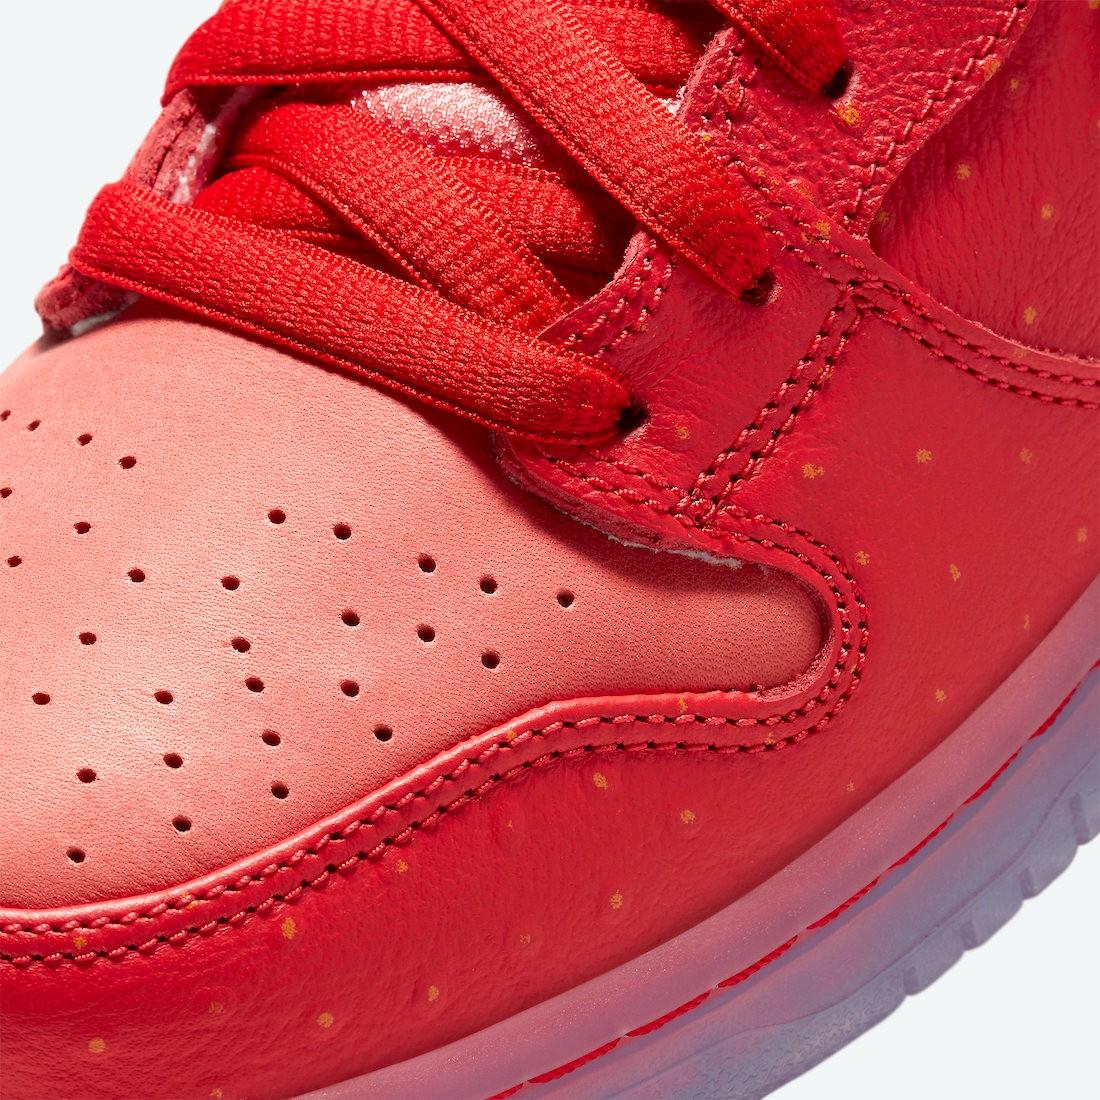 Nike,SB Dunk High,CW7093-600,发  跳票好几次终于要发了?咳嗽草莓 SB Dunk 官图释出!